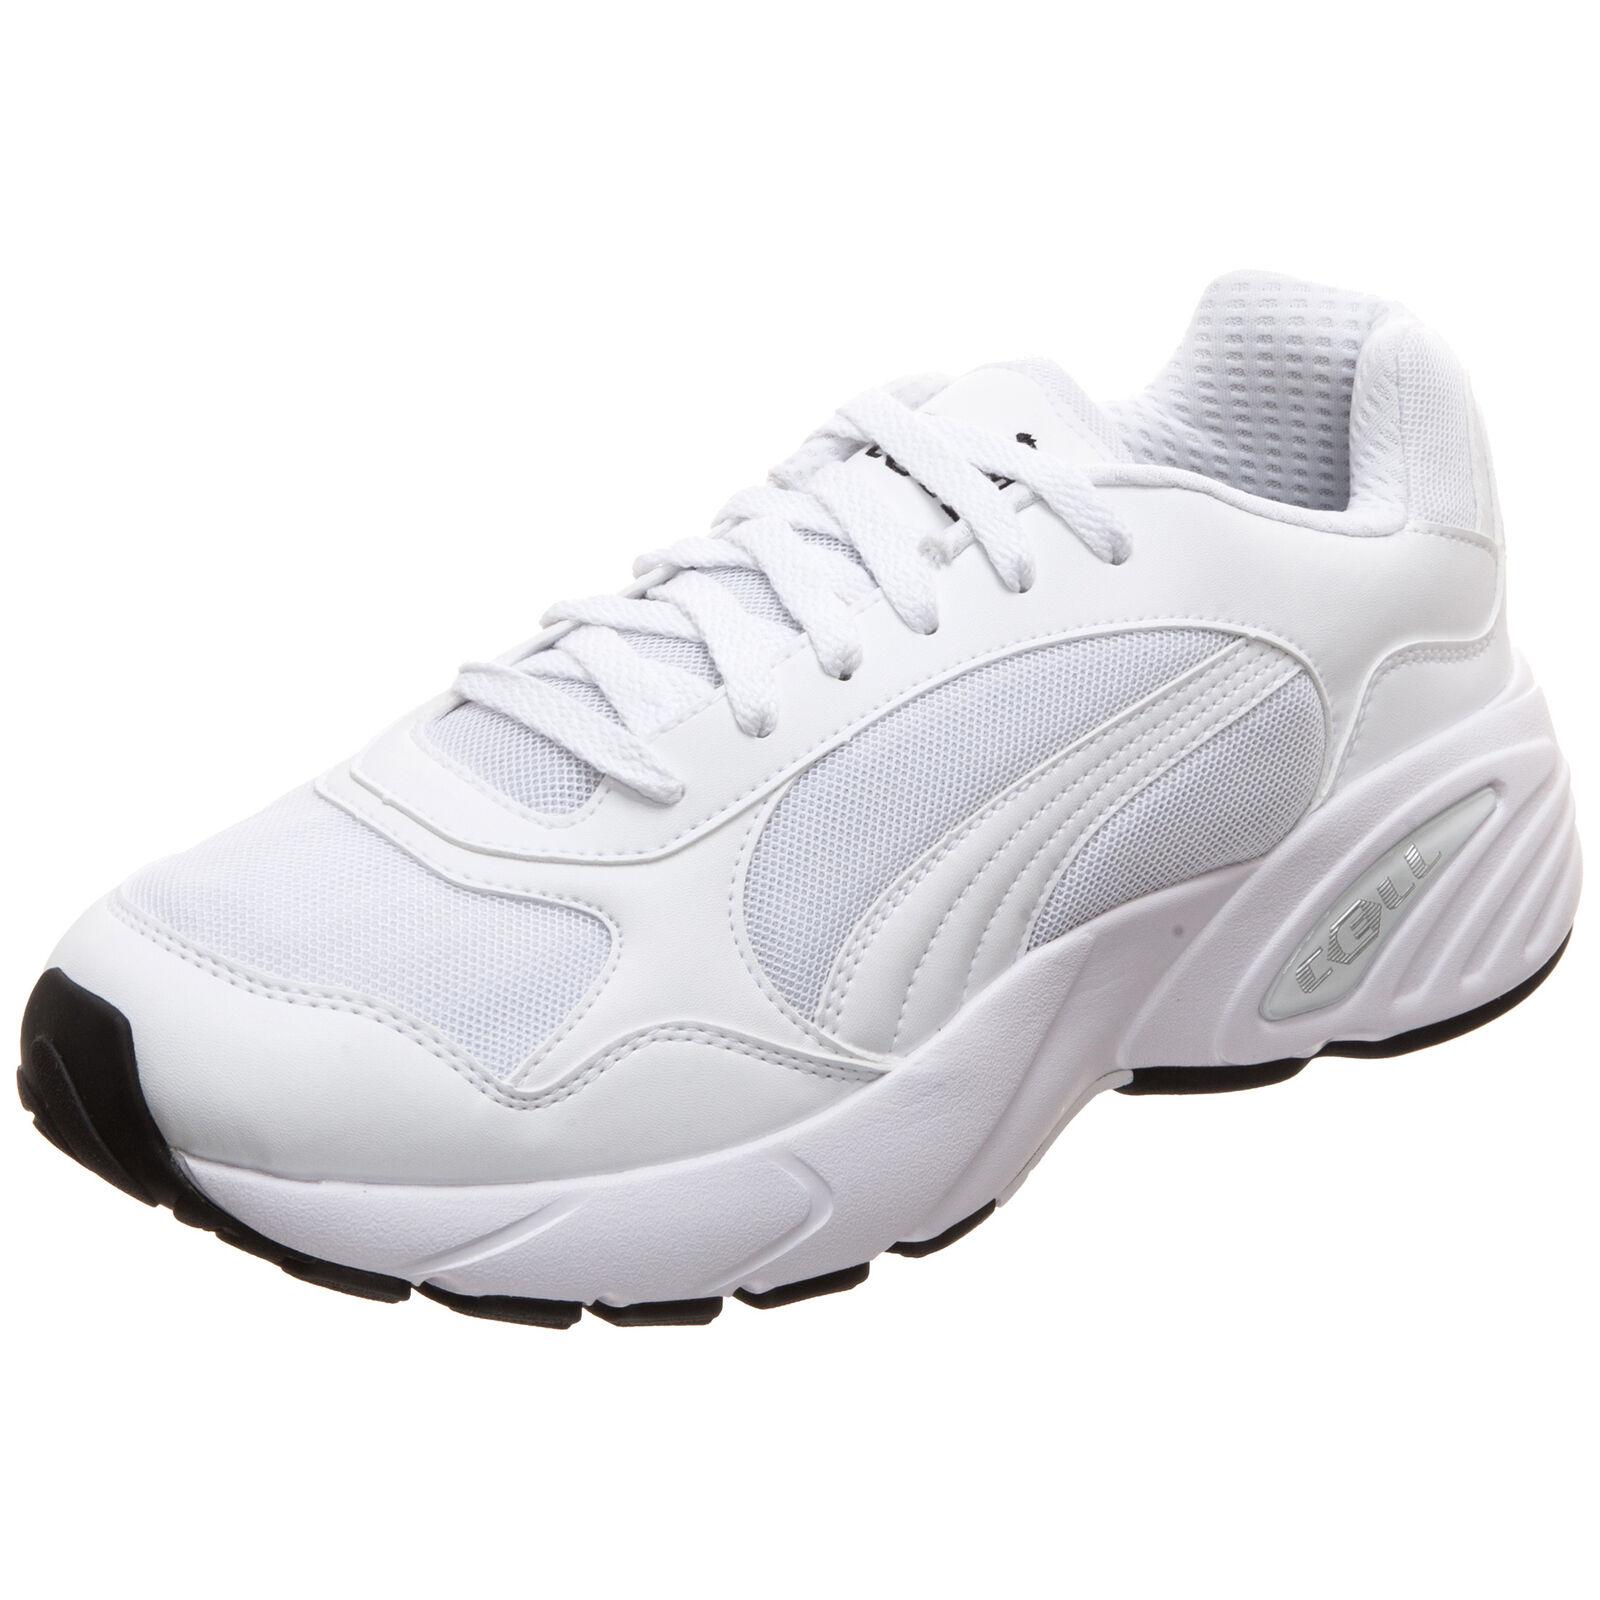 Puma Cell Viper Turnschuhe Herren NEU Schuhe Turnschuhe